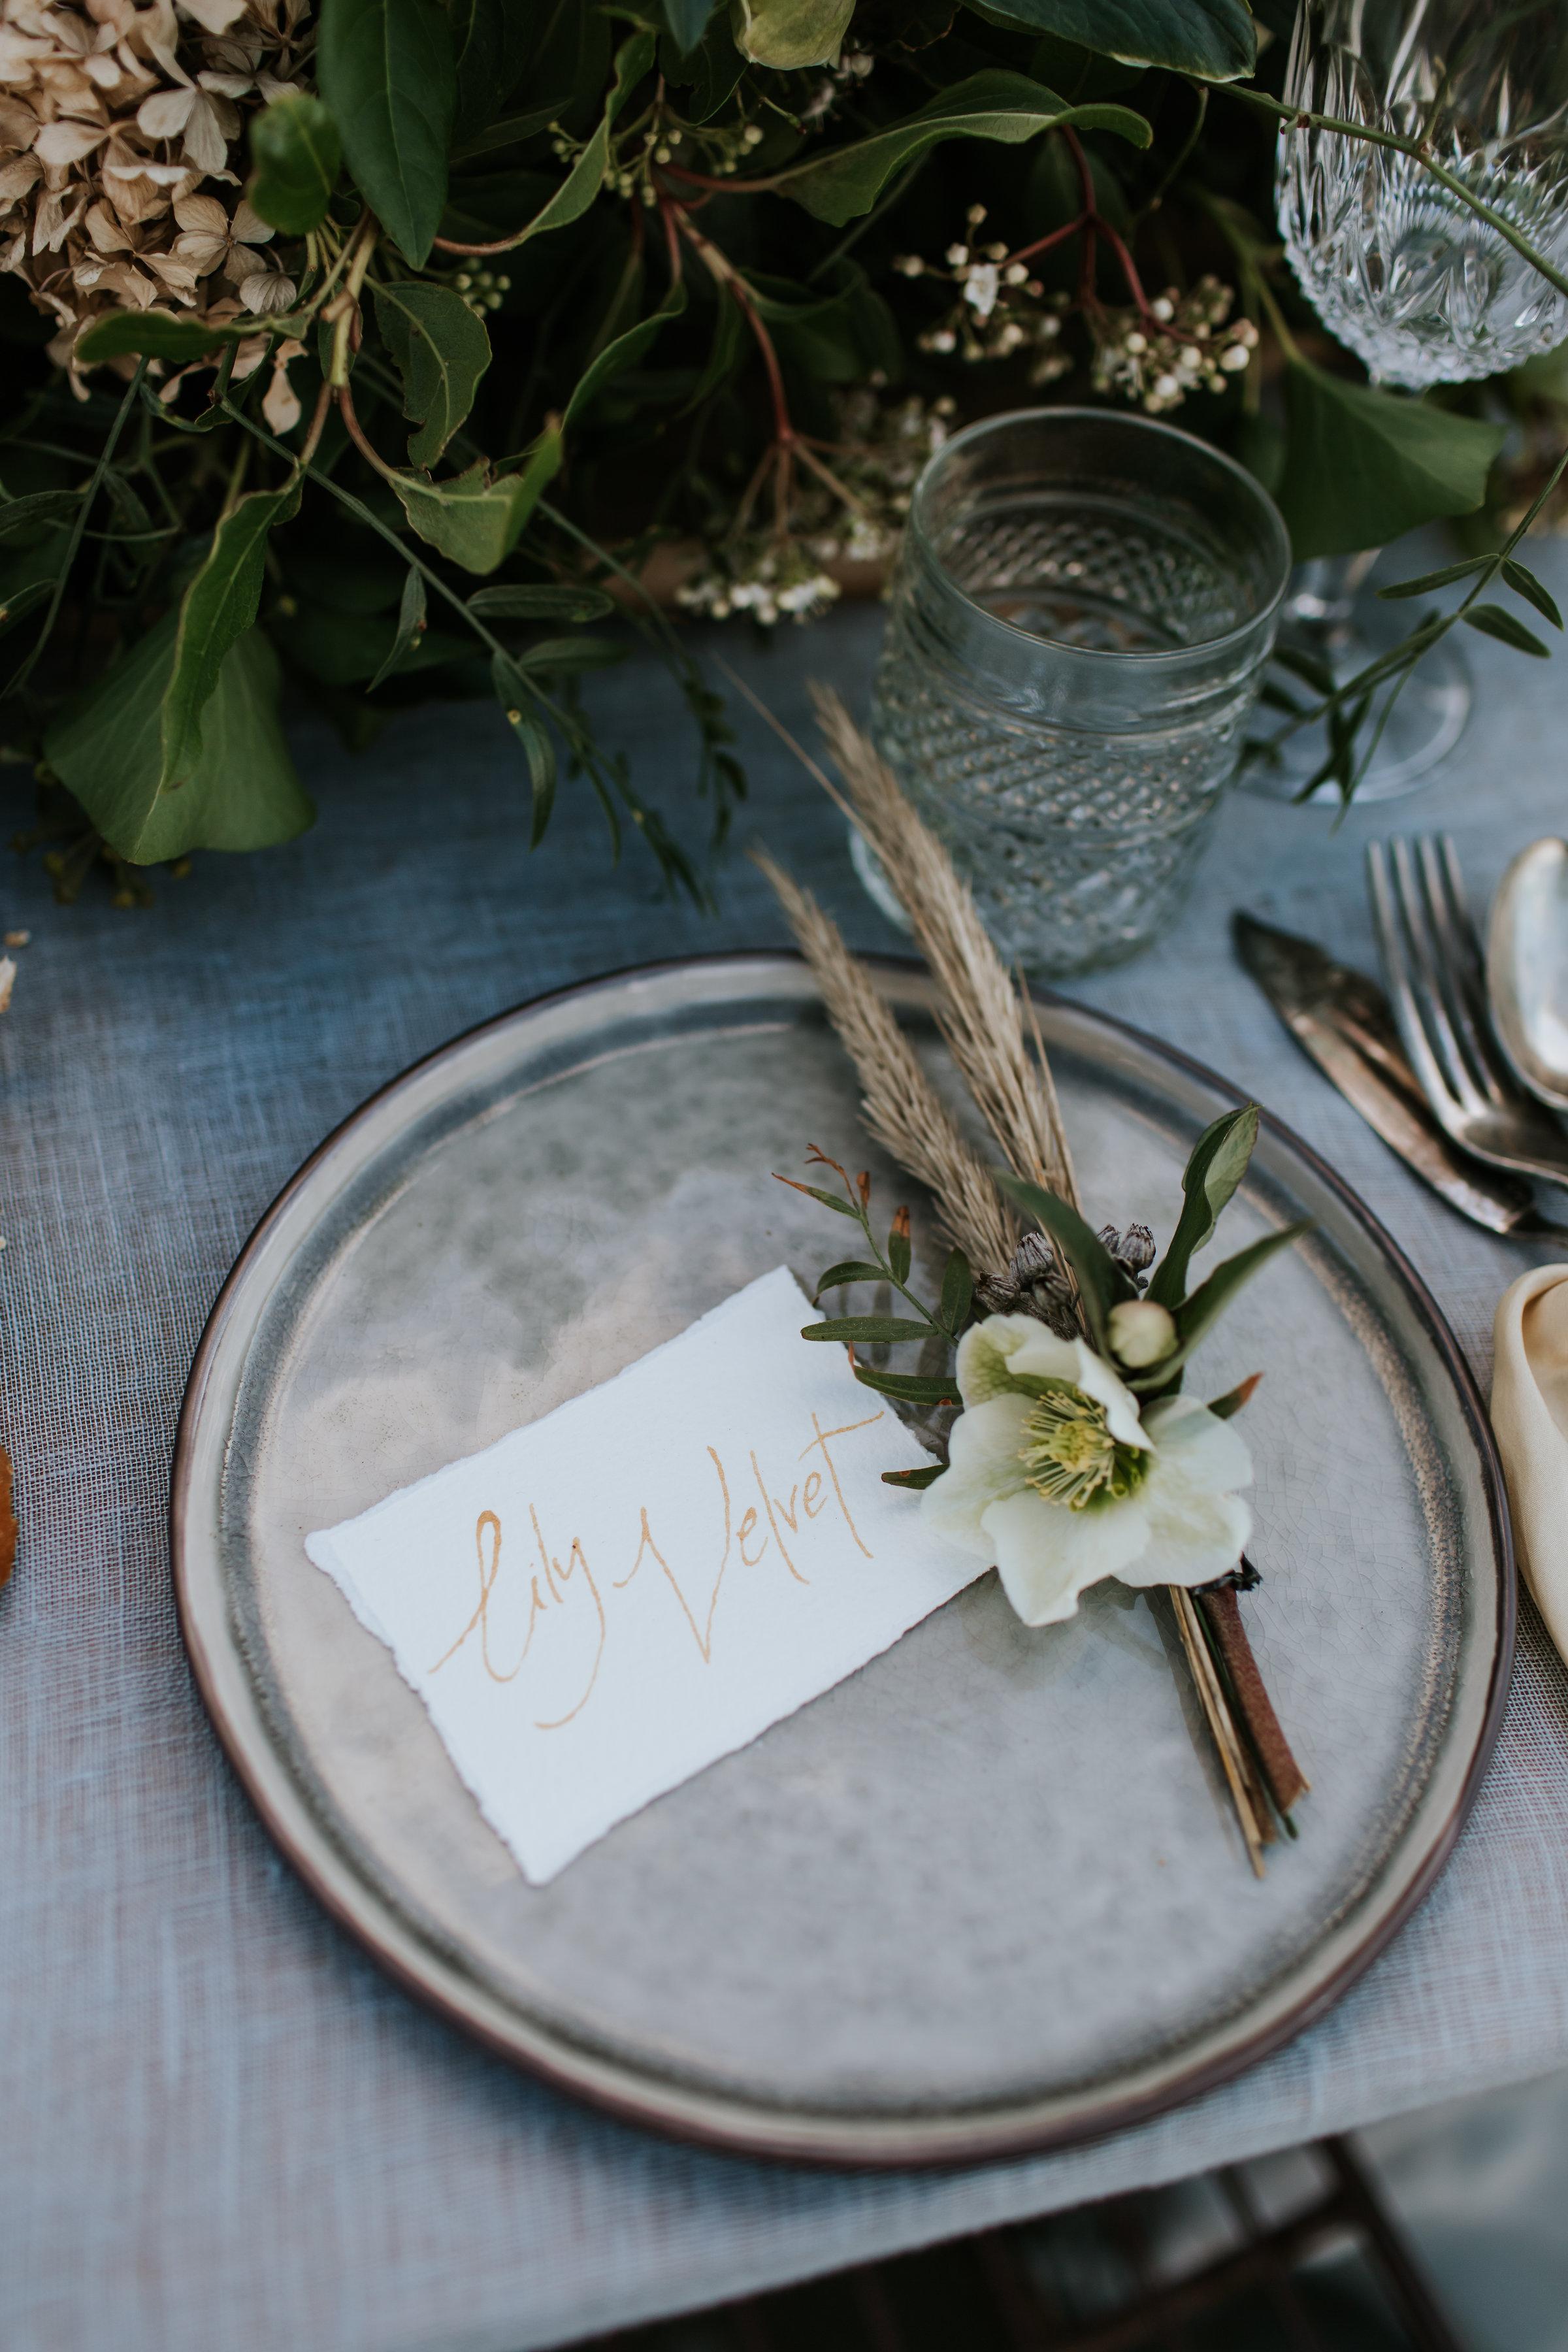 Artisan tableware